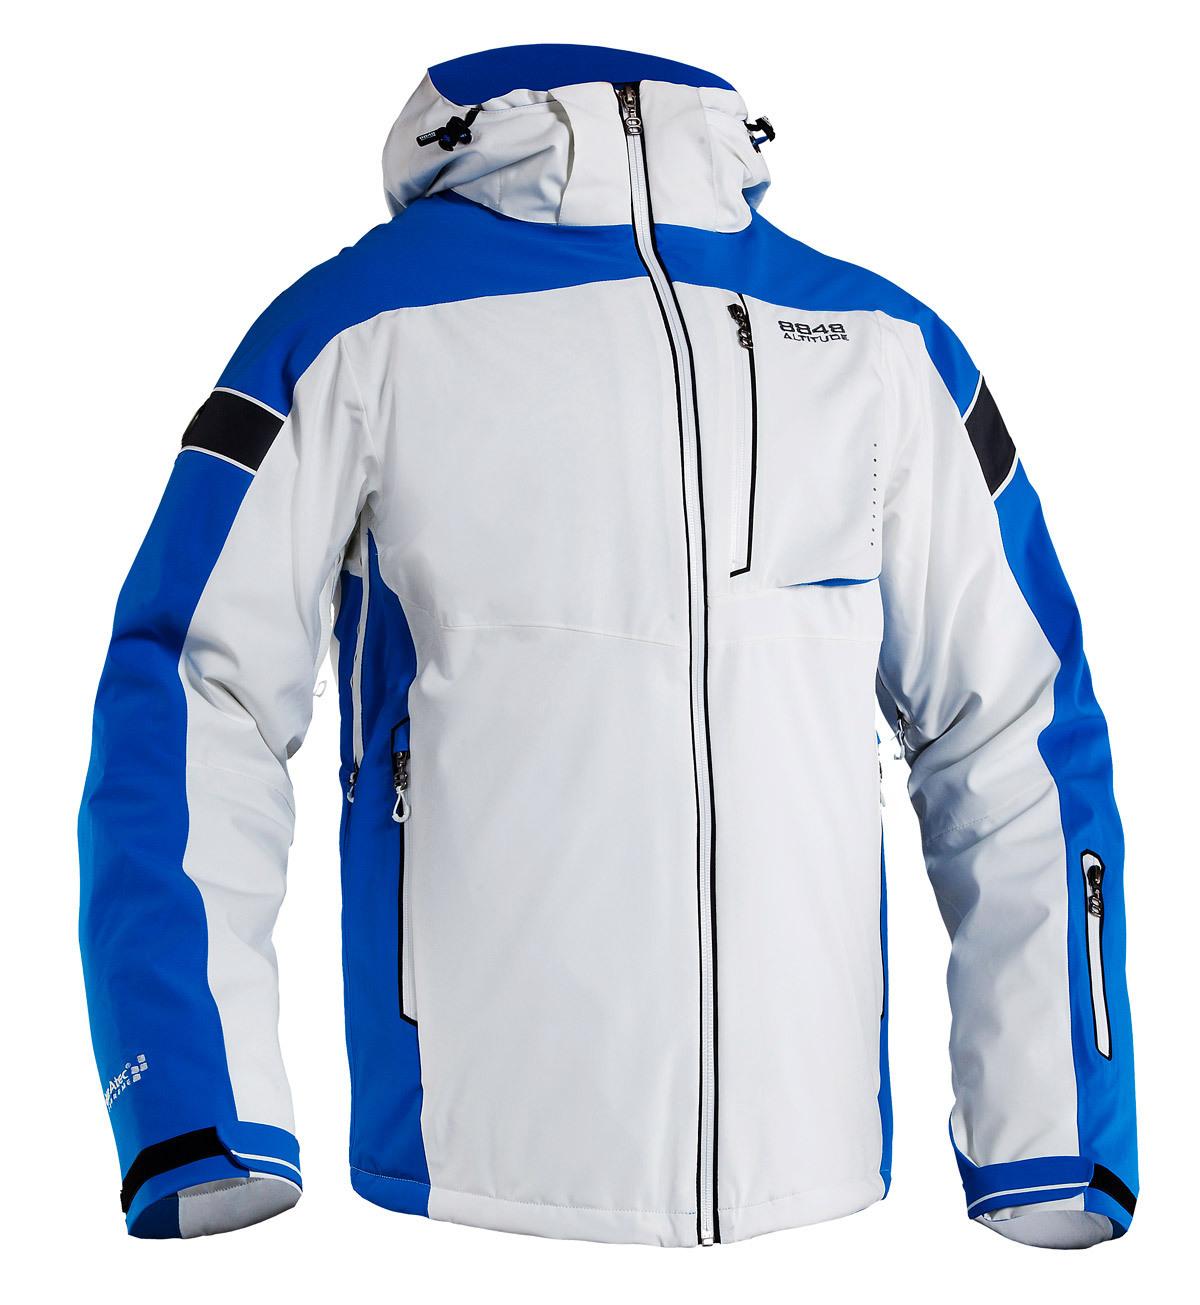 Мужская горнолыжная куртка 8848 ALTITUDE «SWITCH» белая (782952)